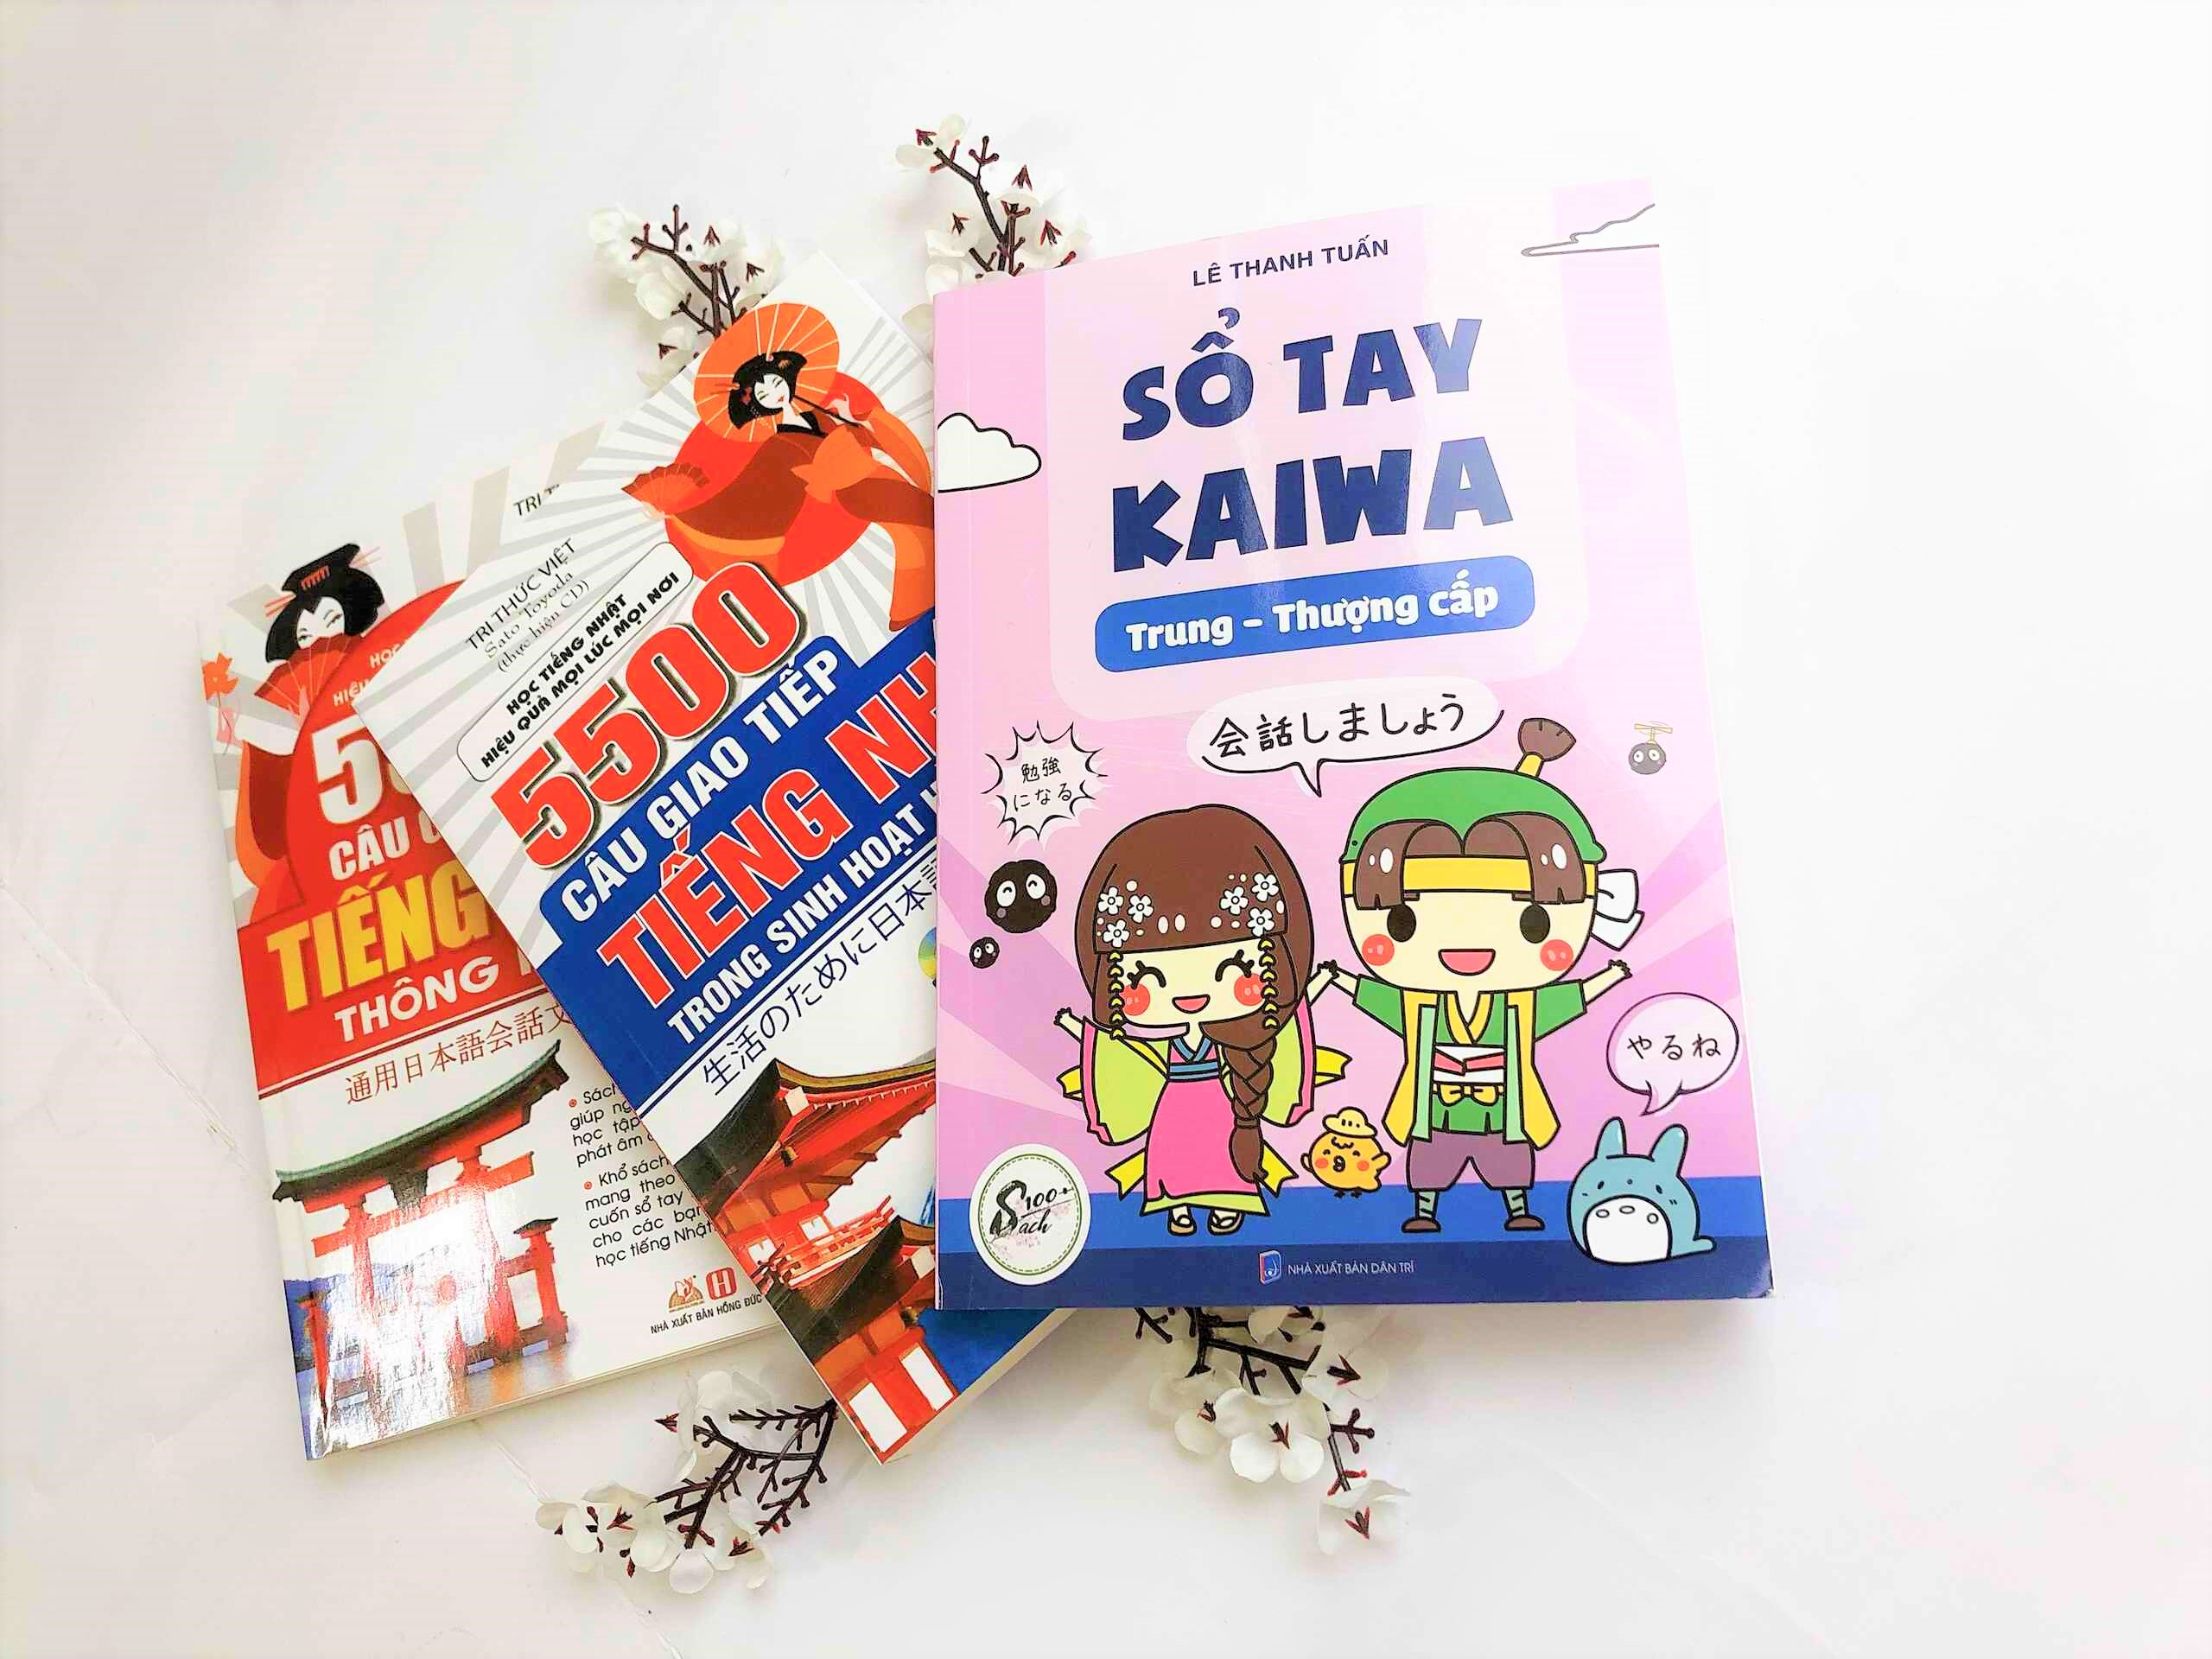 [Freeship] Combo Kaiwa Cấp tốc Sổ tay Kaiwa 3 + 5500 câu giao tiếp tiếng Nhật trong sinh hoạt hằng ngày + 5500 câu giao tiếp tiếng Nhật thông dụng